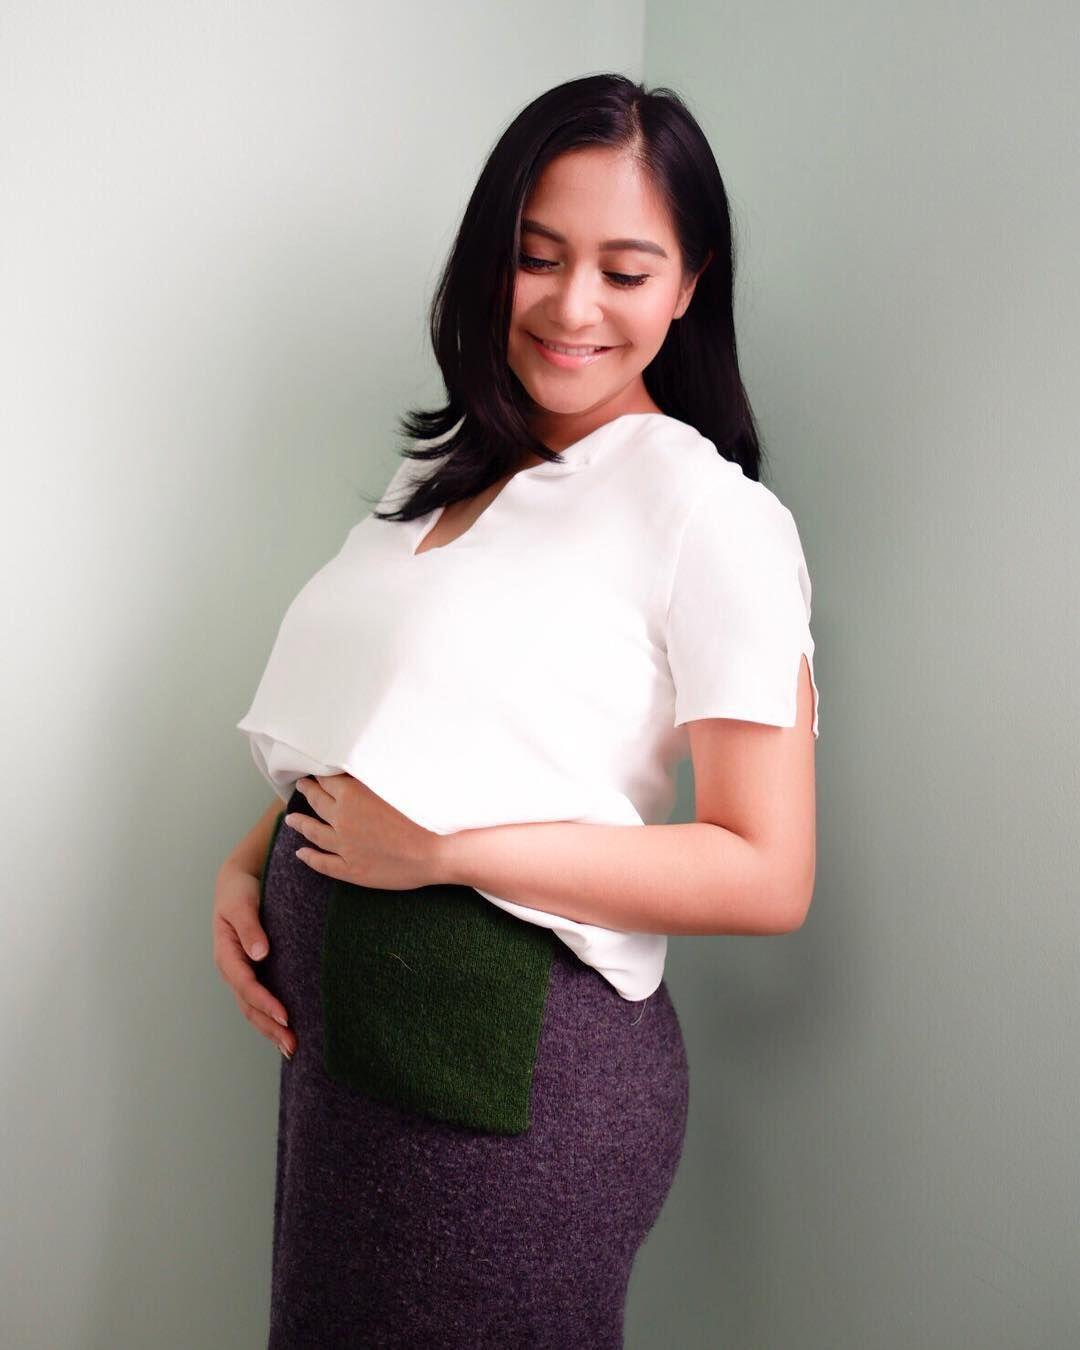 9 Potret Kehamilan Caca Tengker, Makin Manis dan Bersahaja